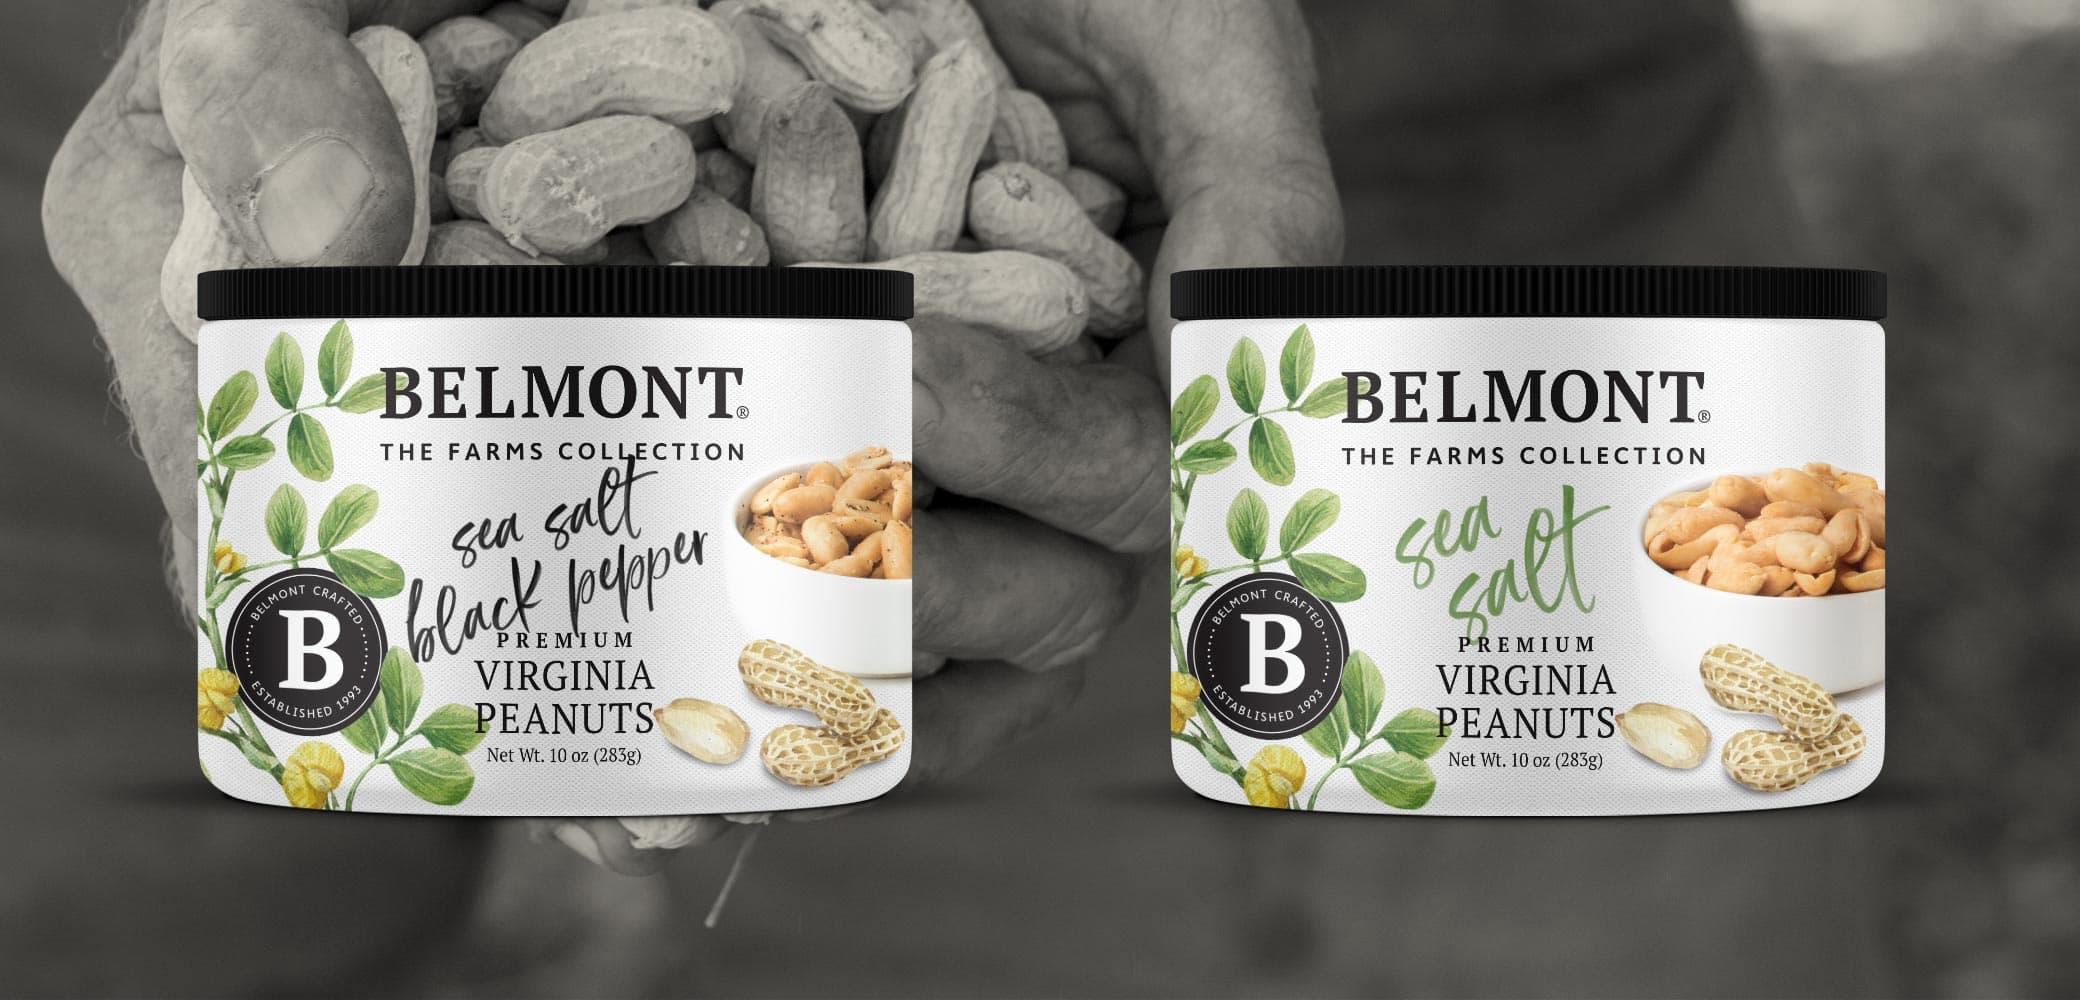 Belmont Peanuts Label Design by Red Chalk Studios